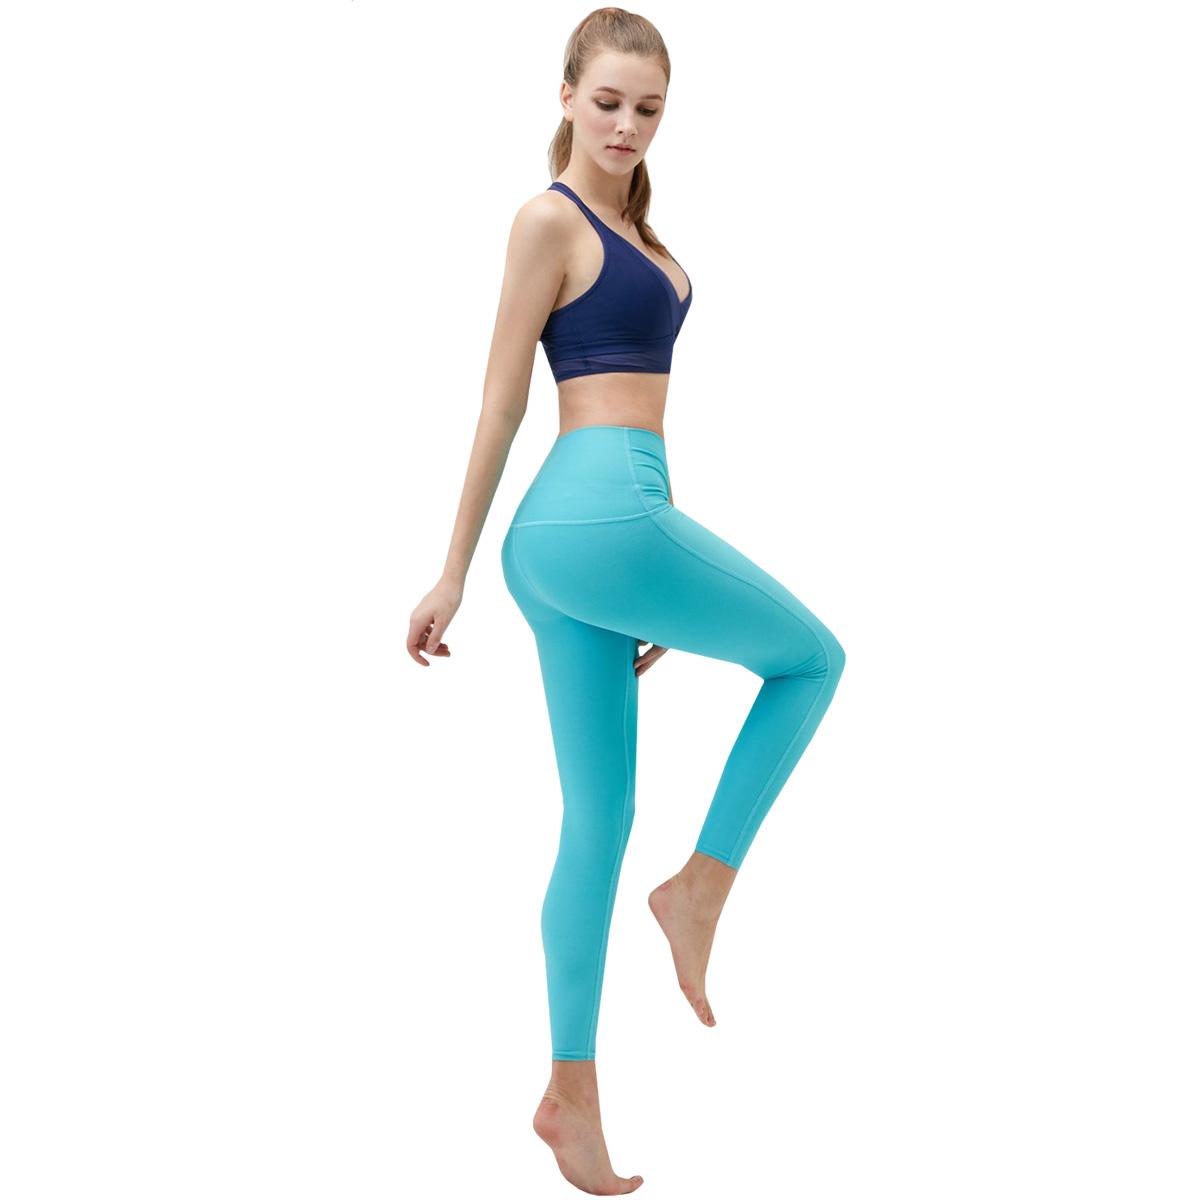 thumbnail 6 - TSLA Tesla FYP42 Women's High-Waisted Ultra-Stretch Tummy Control Yoga Pants